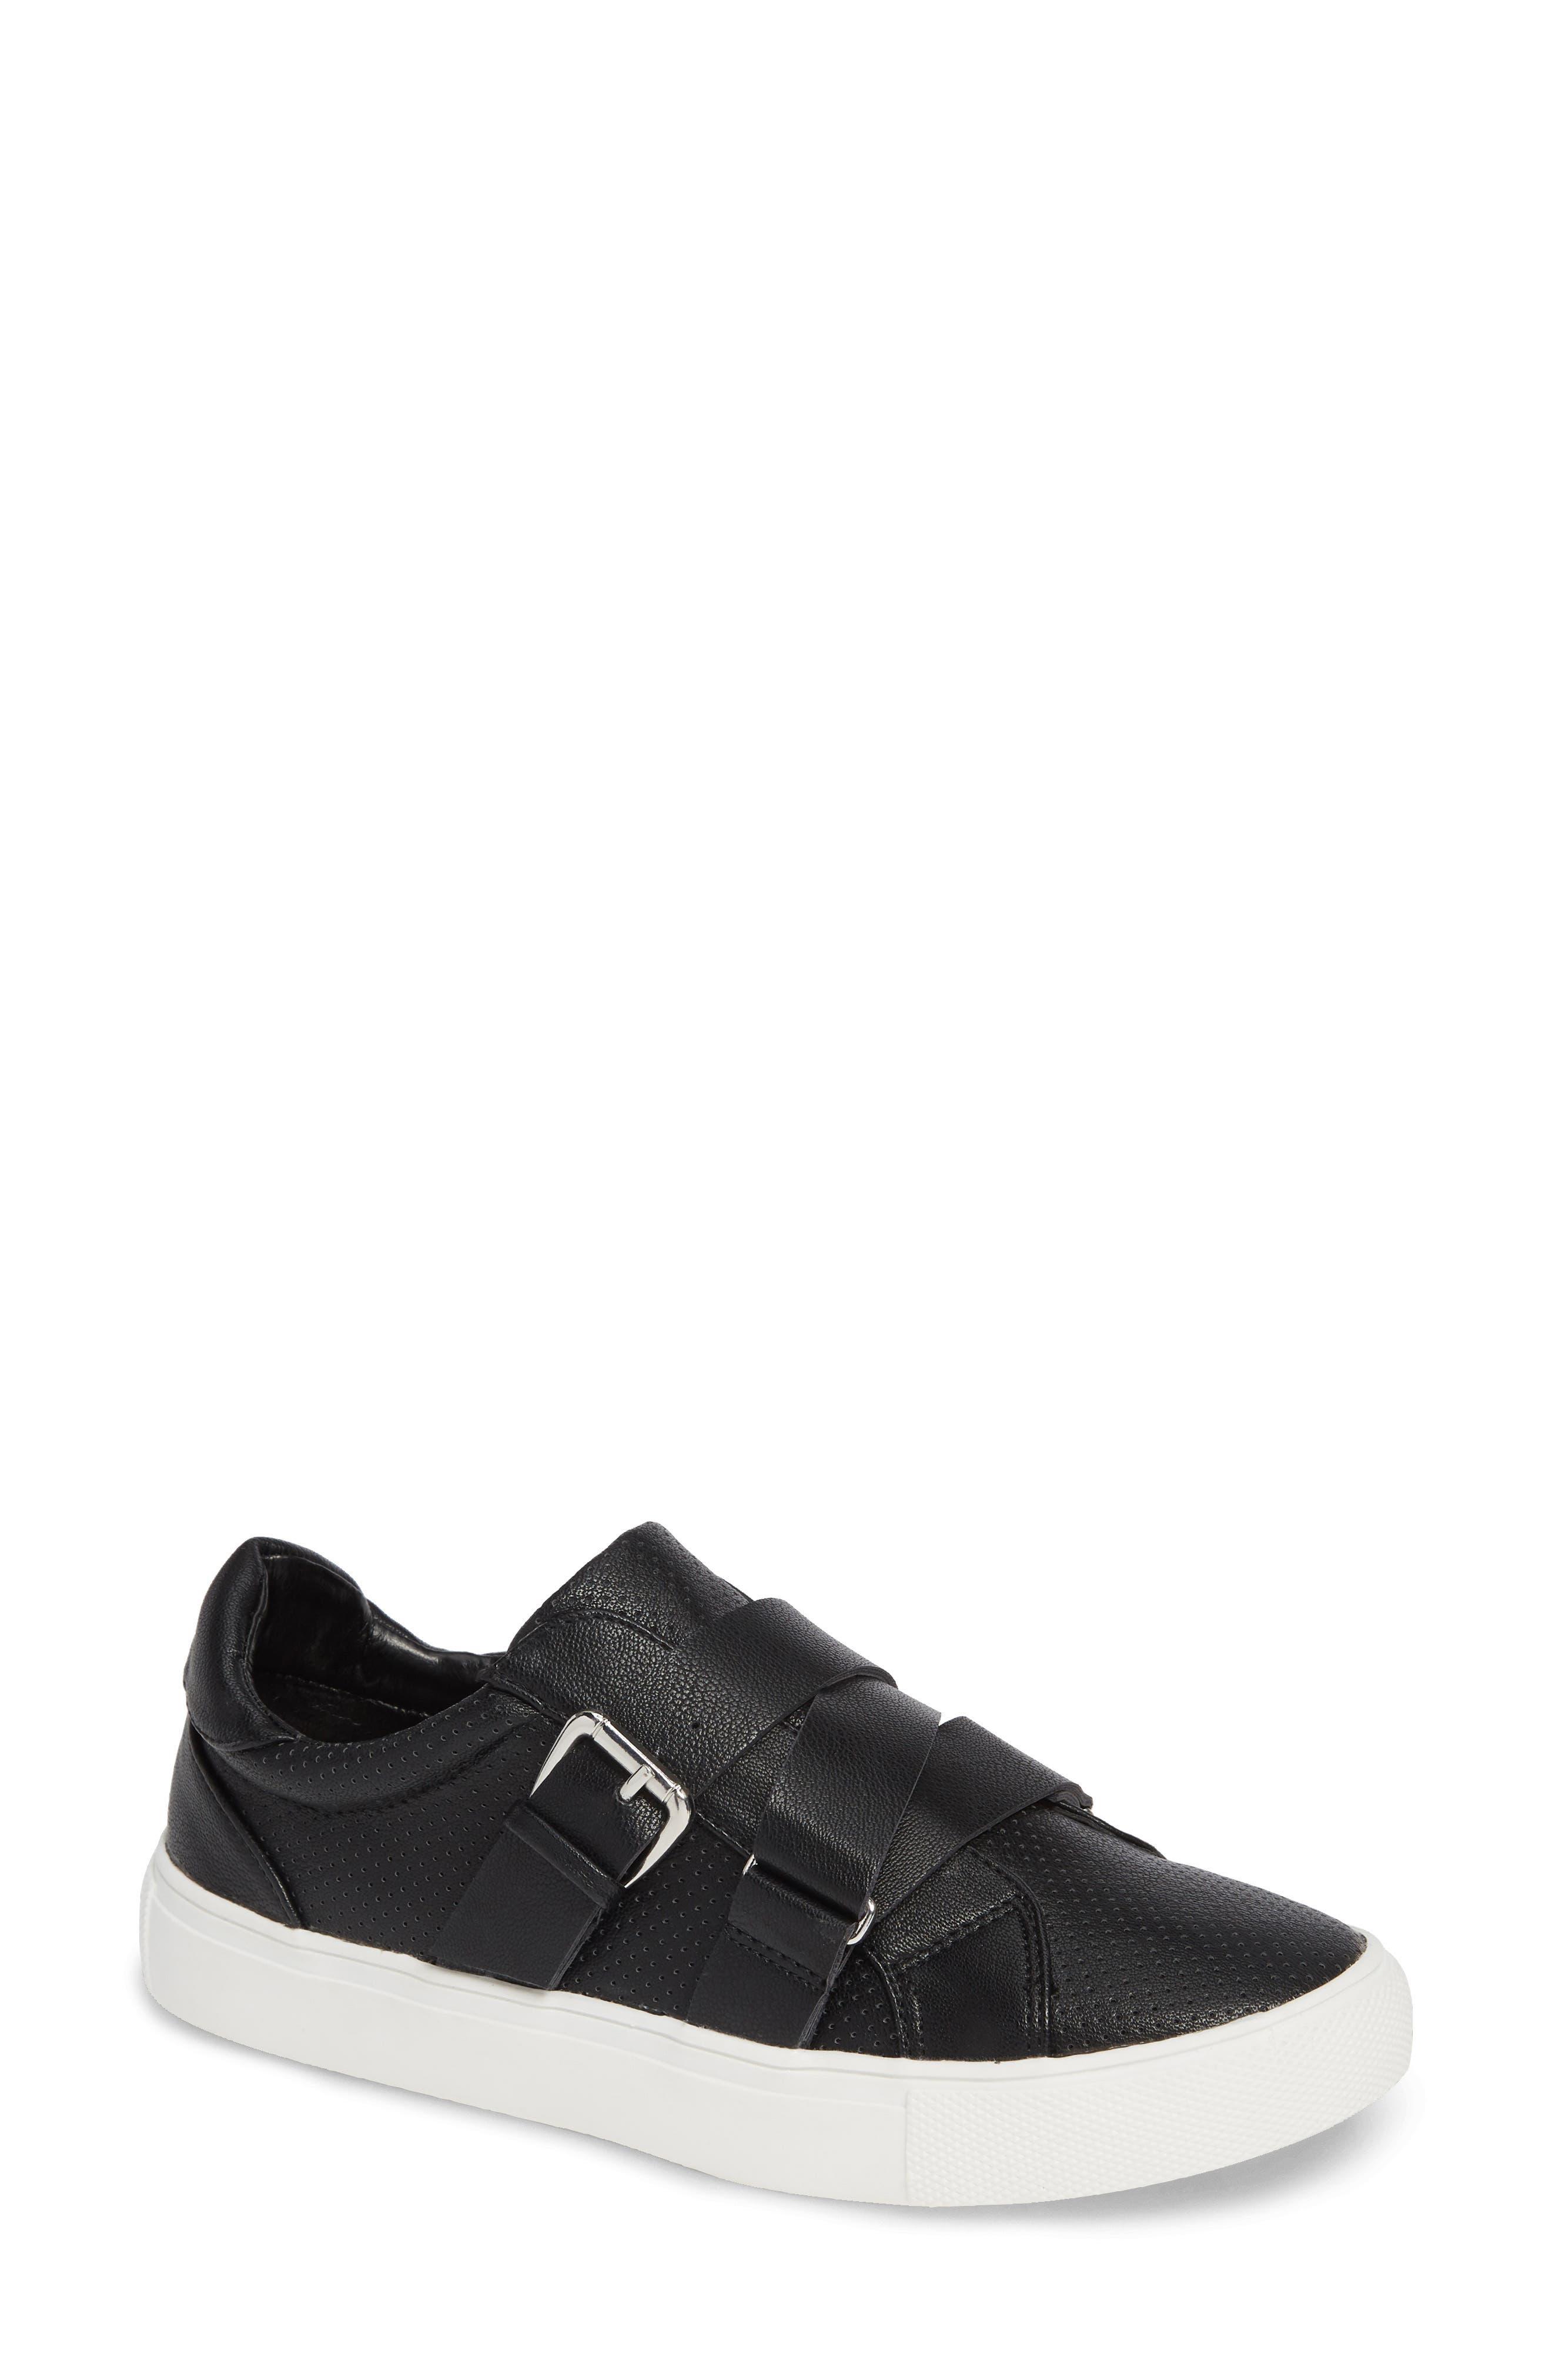 Kaelynn Sneaker,                             Main thumbnail 1, color,                             BLACK